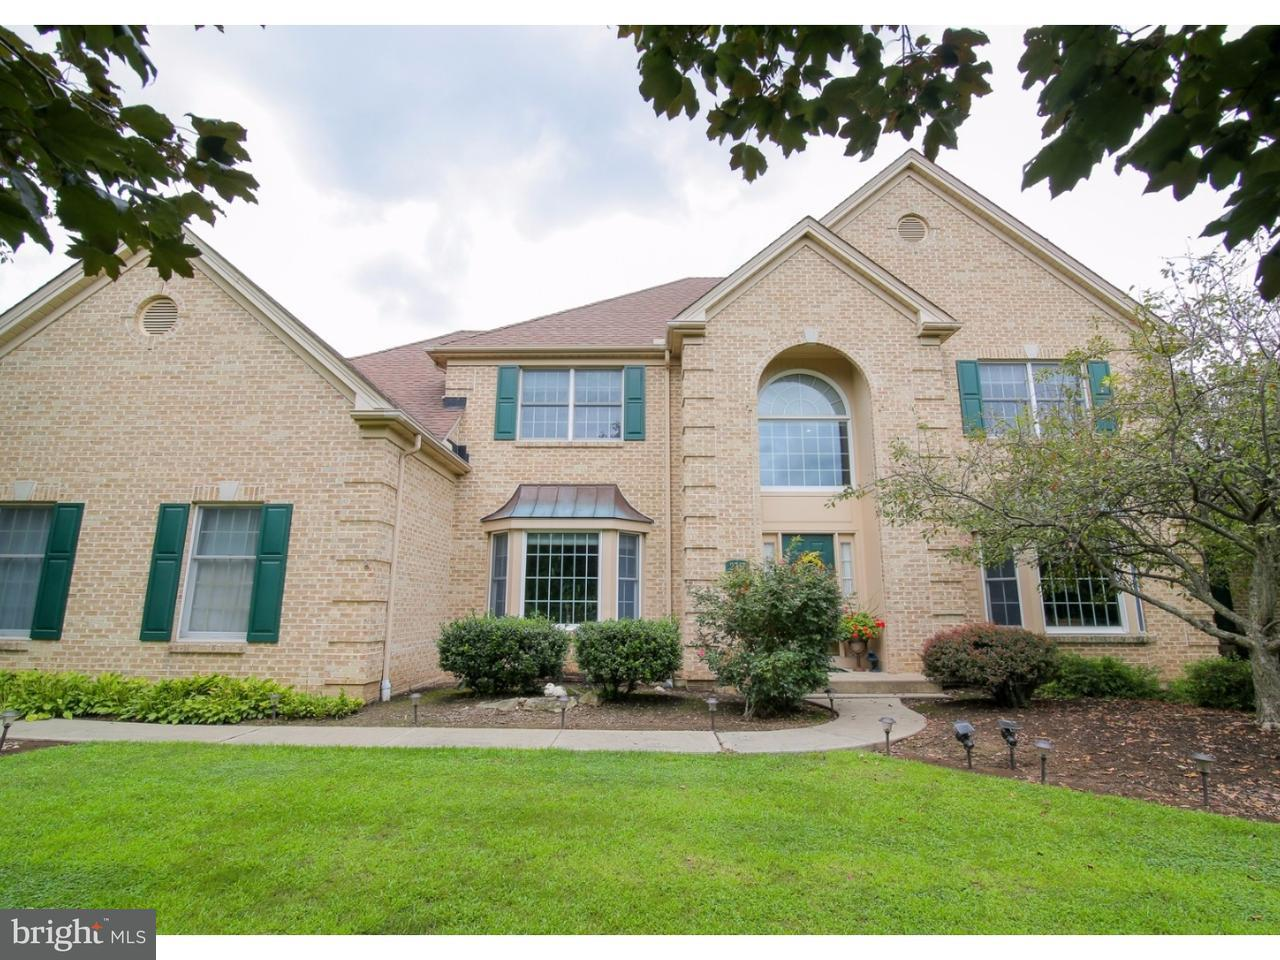 Single Family Home for Sale at 2717 KINGSBRIDGE Lane Allentown, Pennsylvania 18103 United States